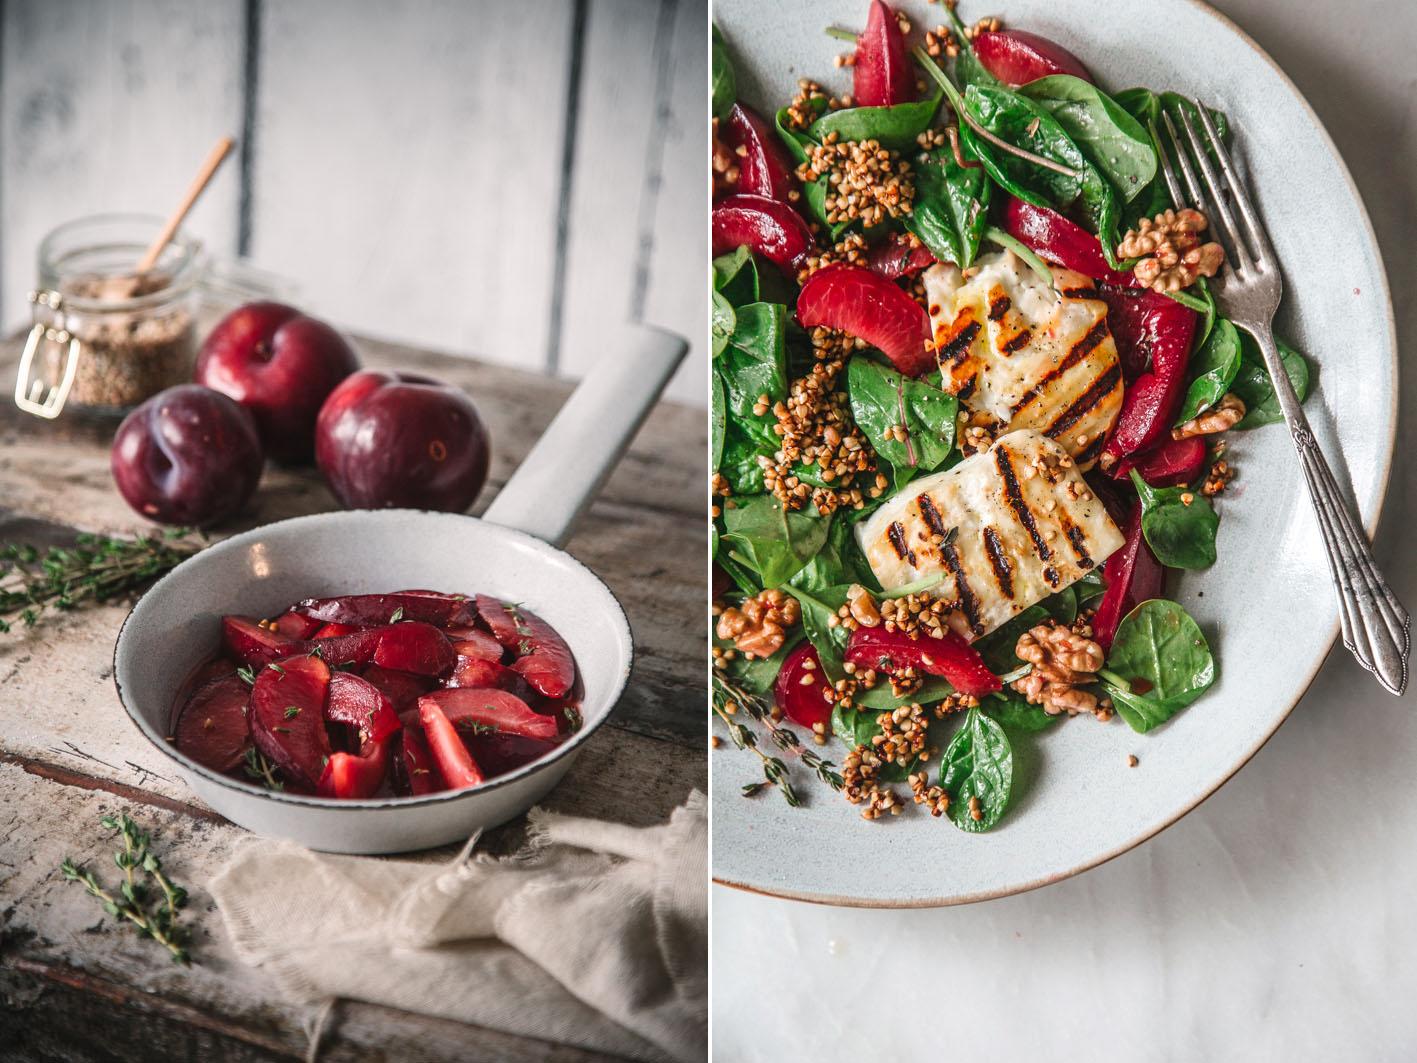 Salat mit Halloumi und gerösteten Pflaumen